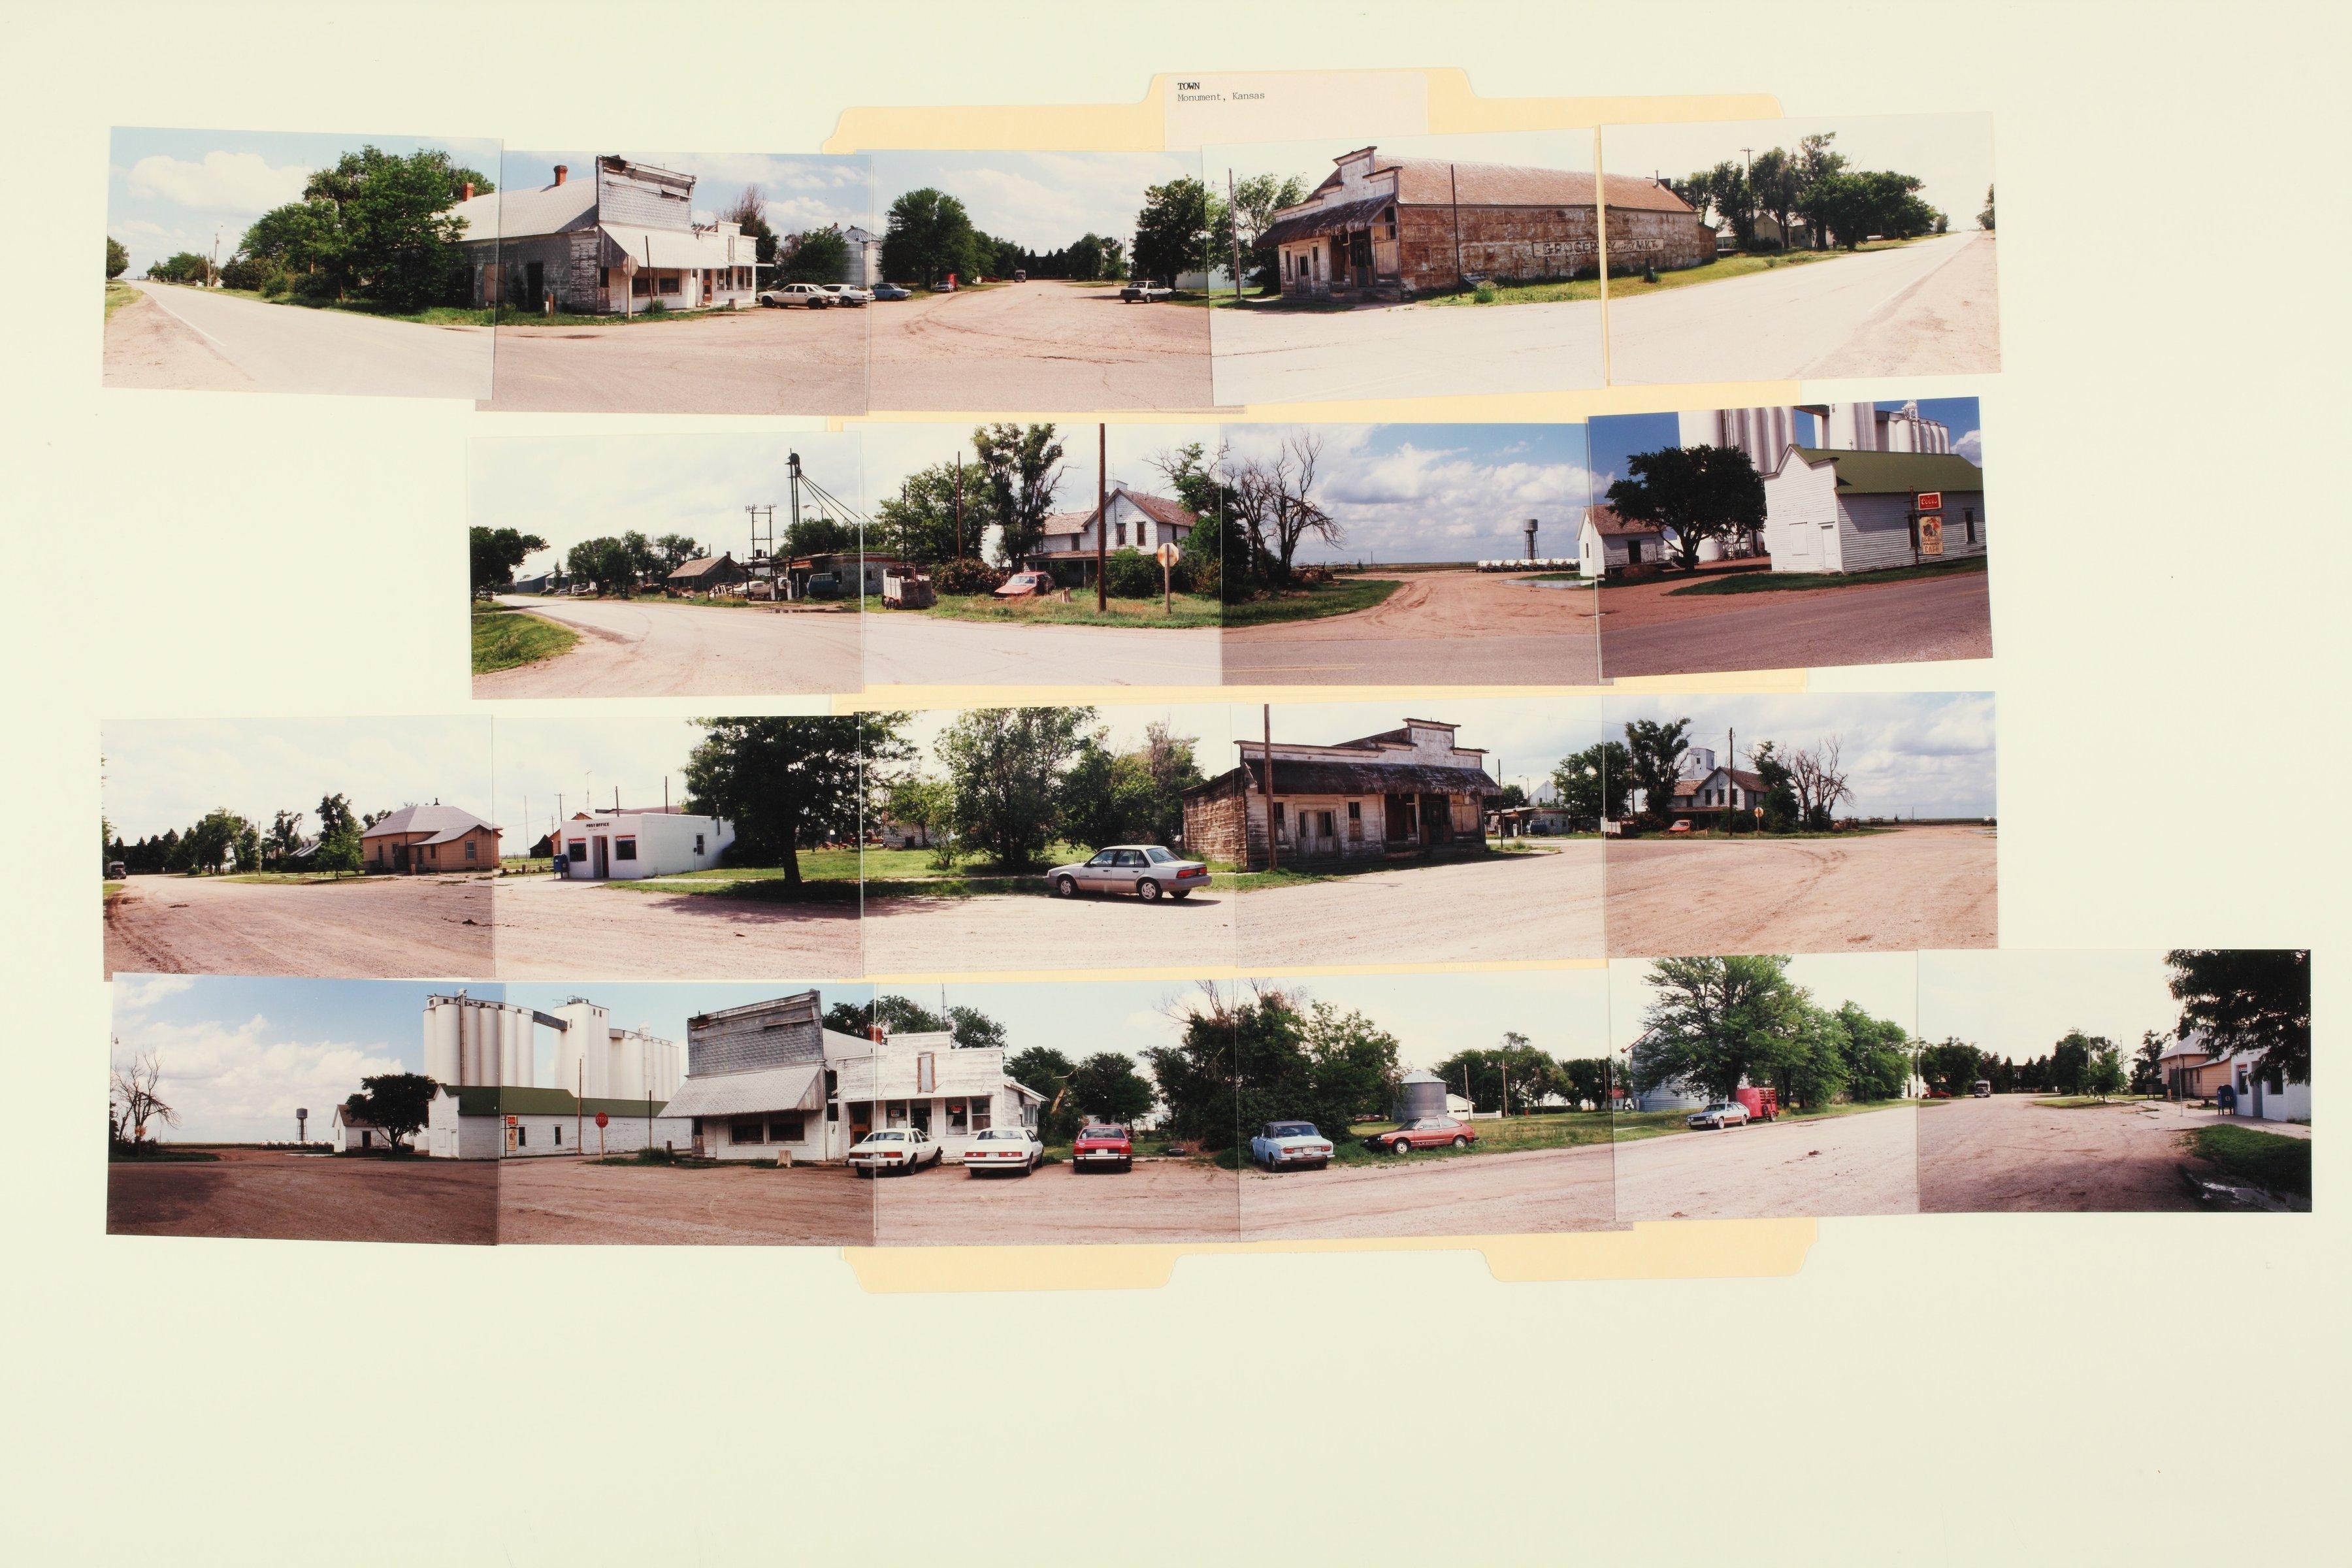 Kansas Film Commission site photographs, towns Leavenworth-Norway - 220